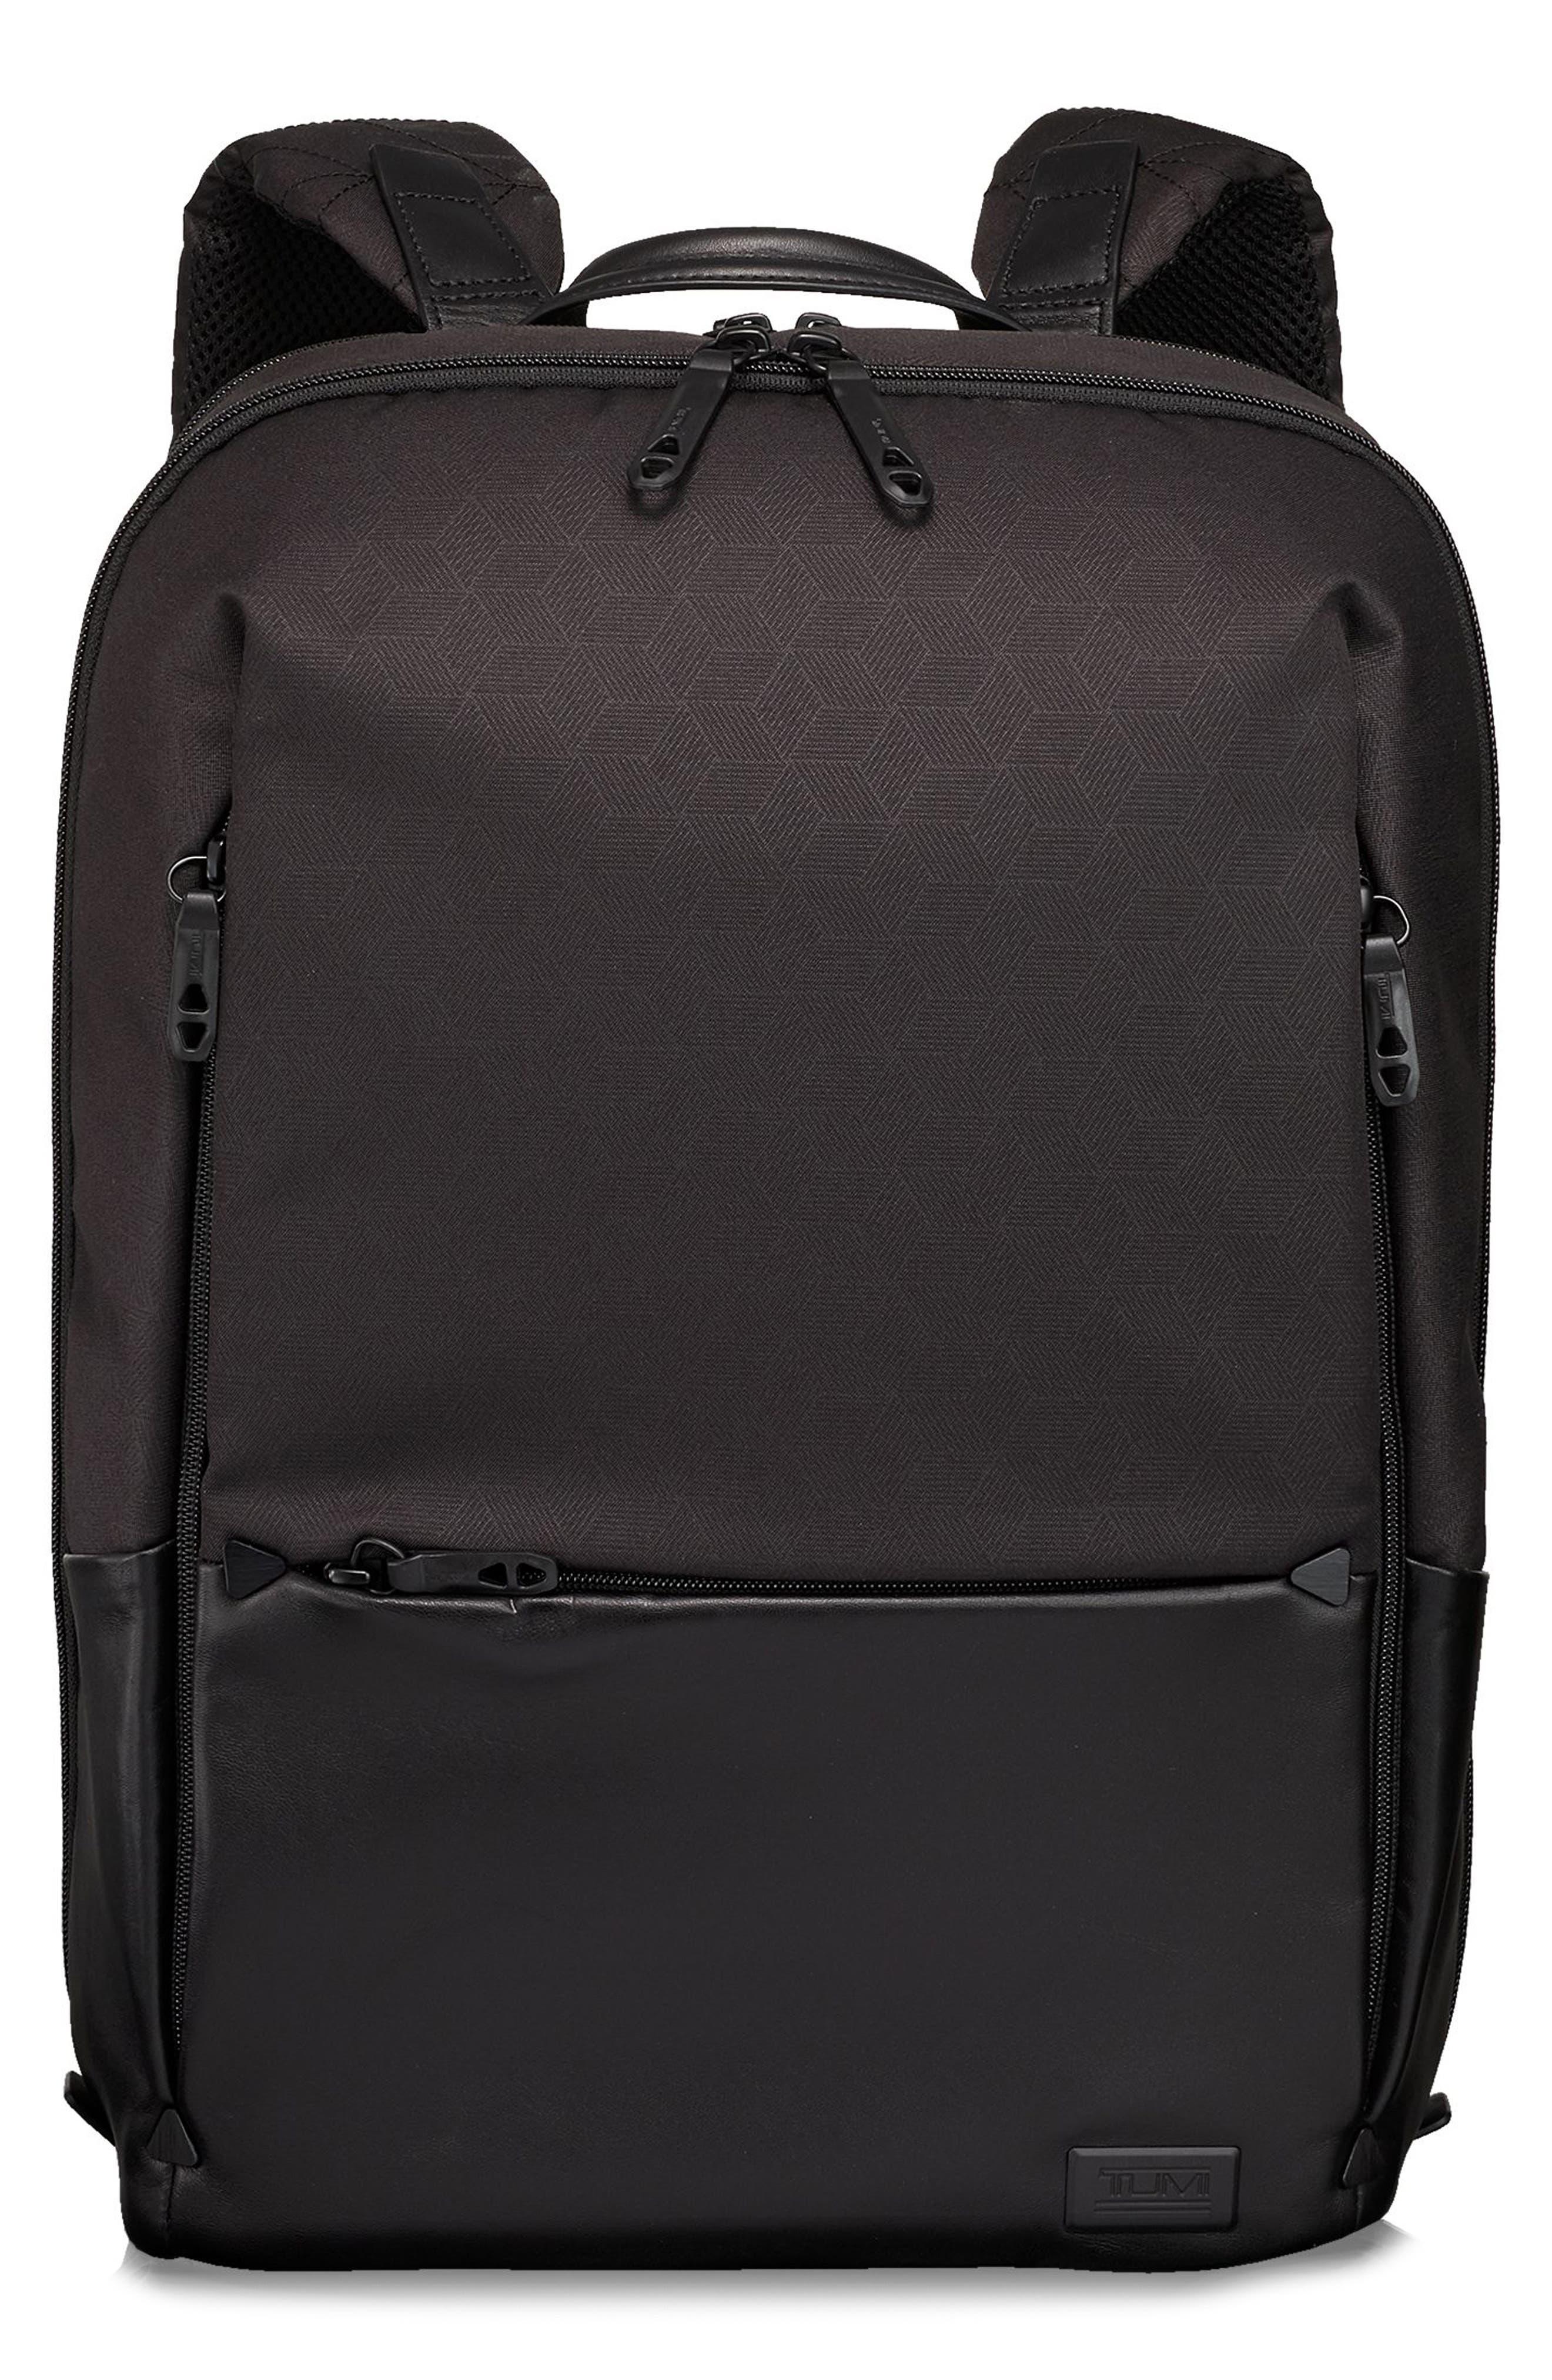 Butler Backpack,                             Main thumbnail 1, color,